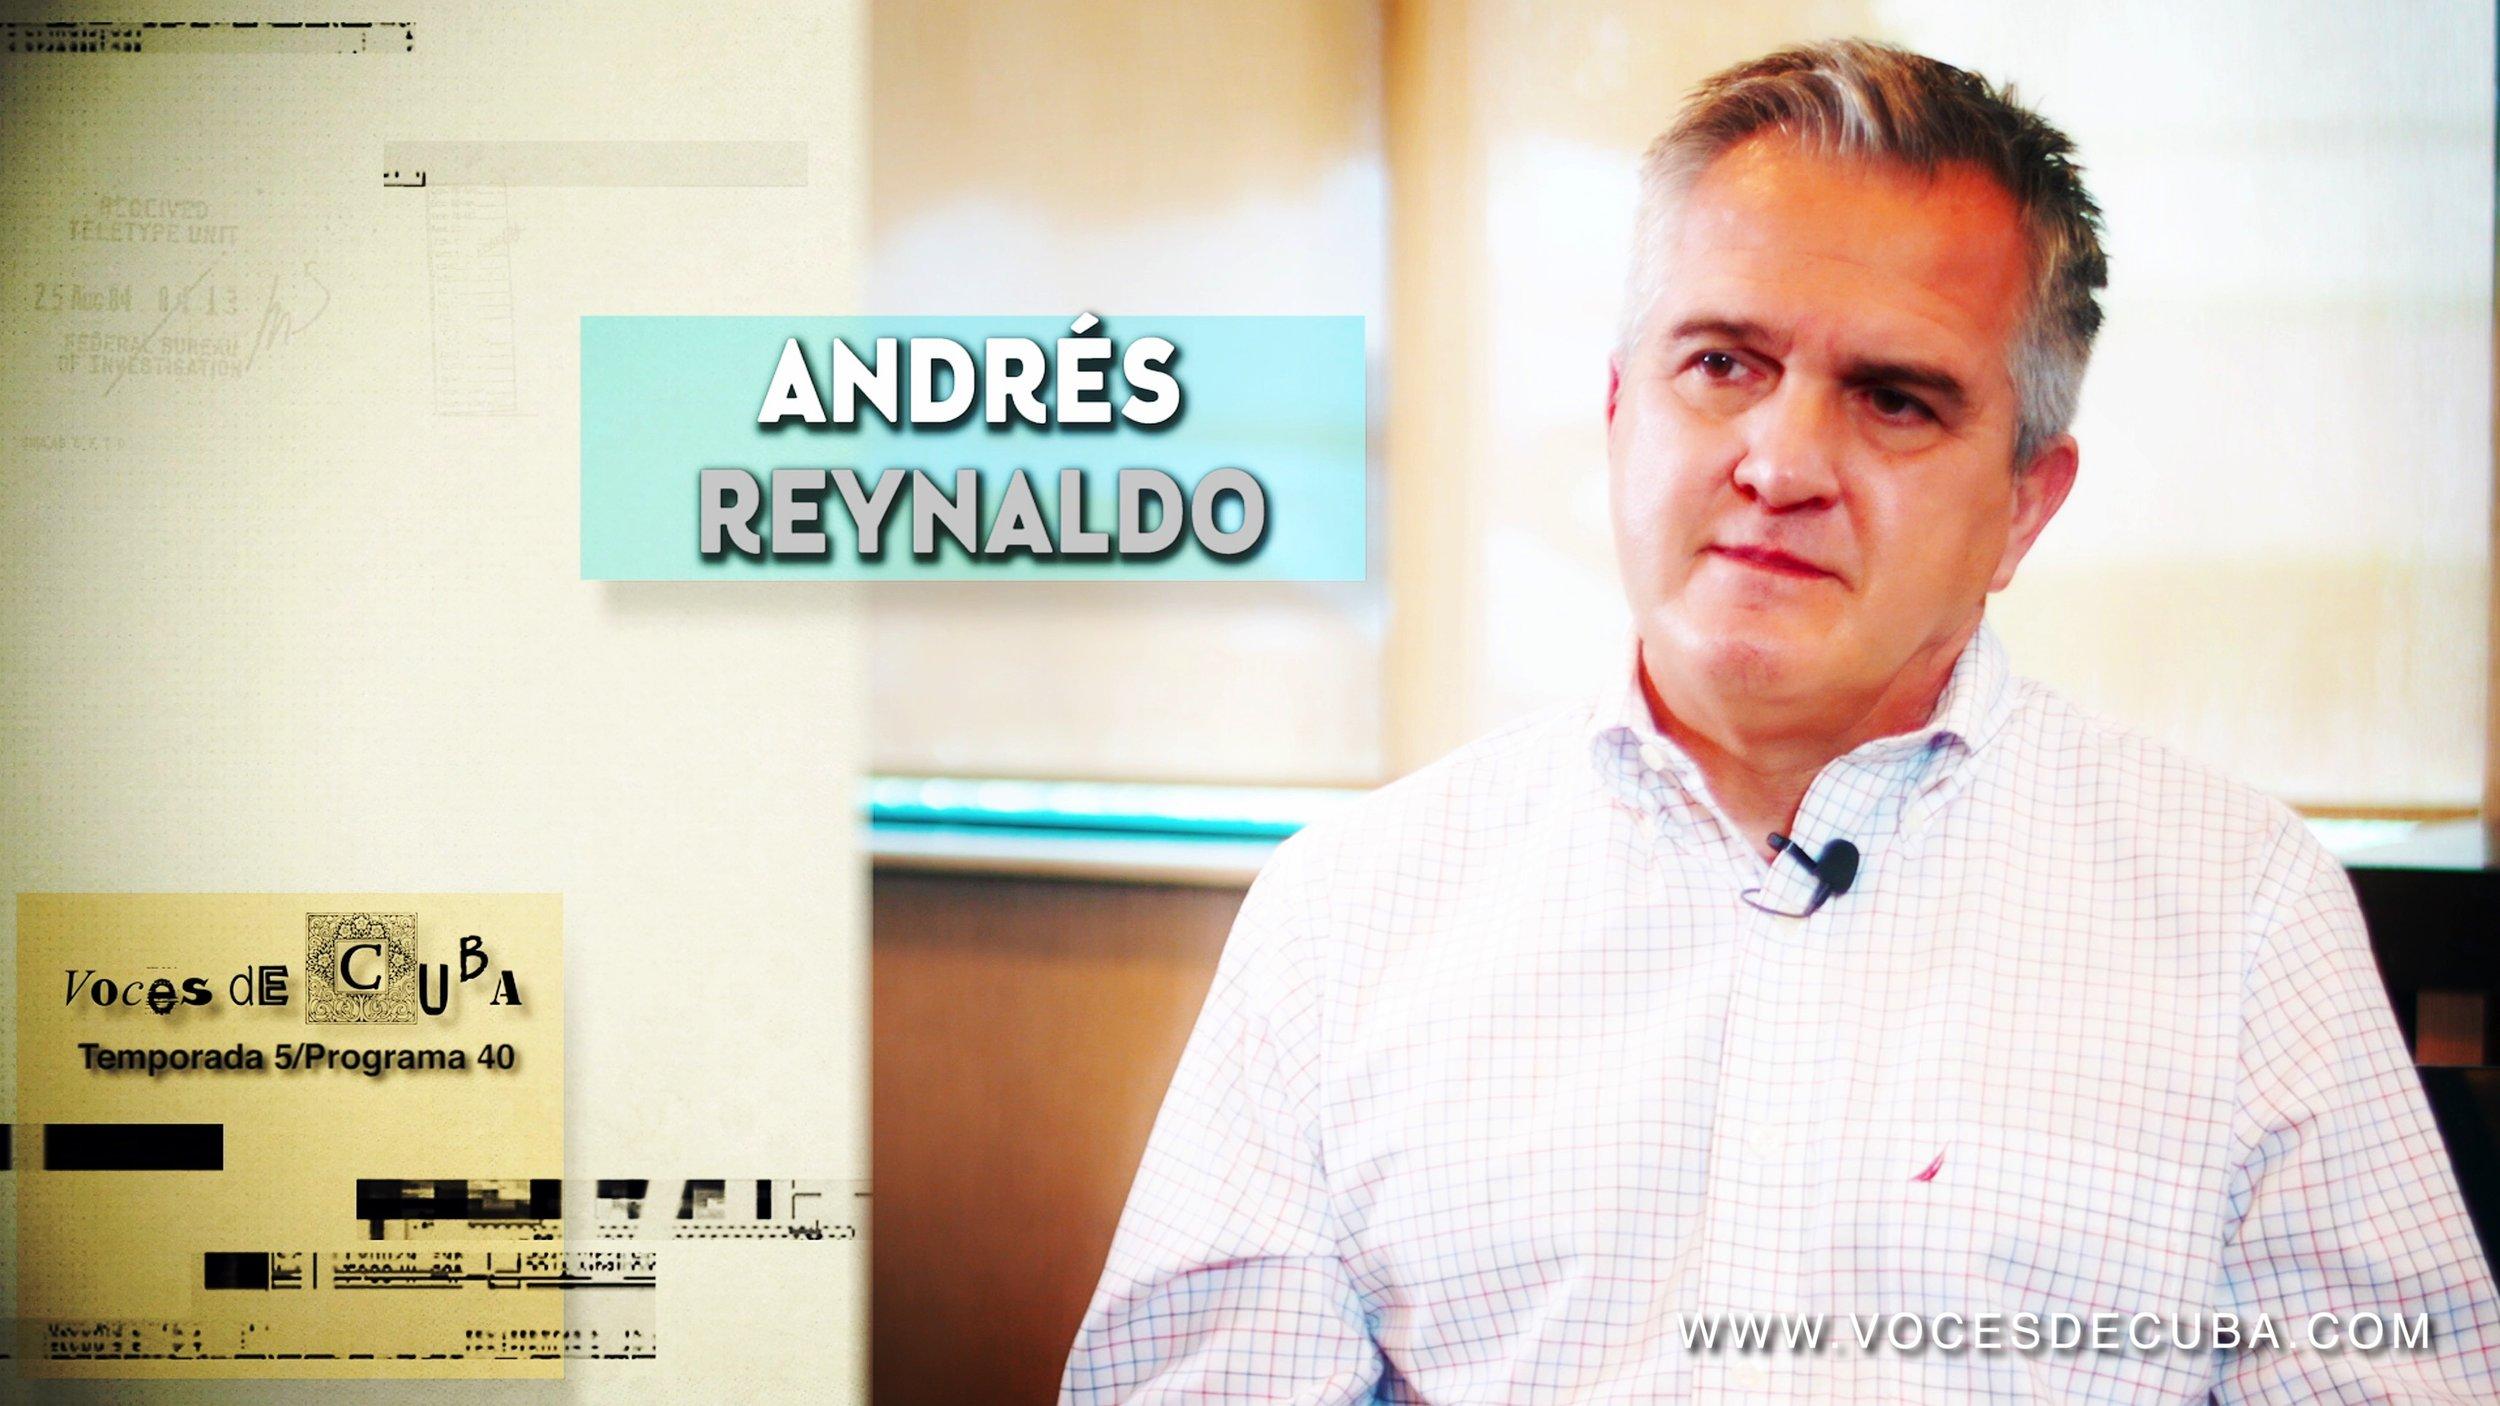 ANDRÉS REYNALDO 01.jpg